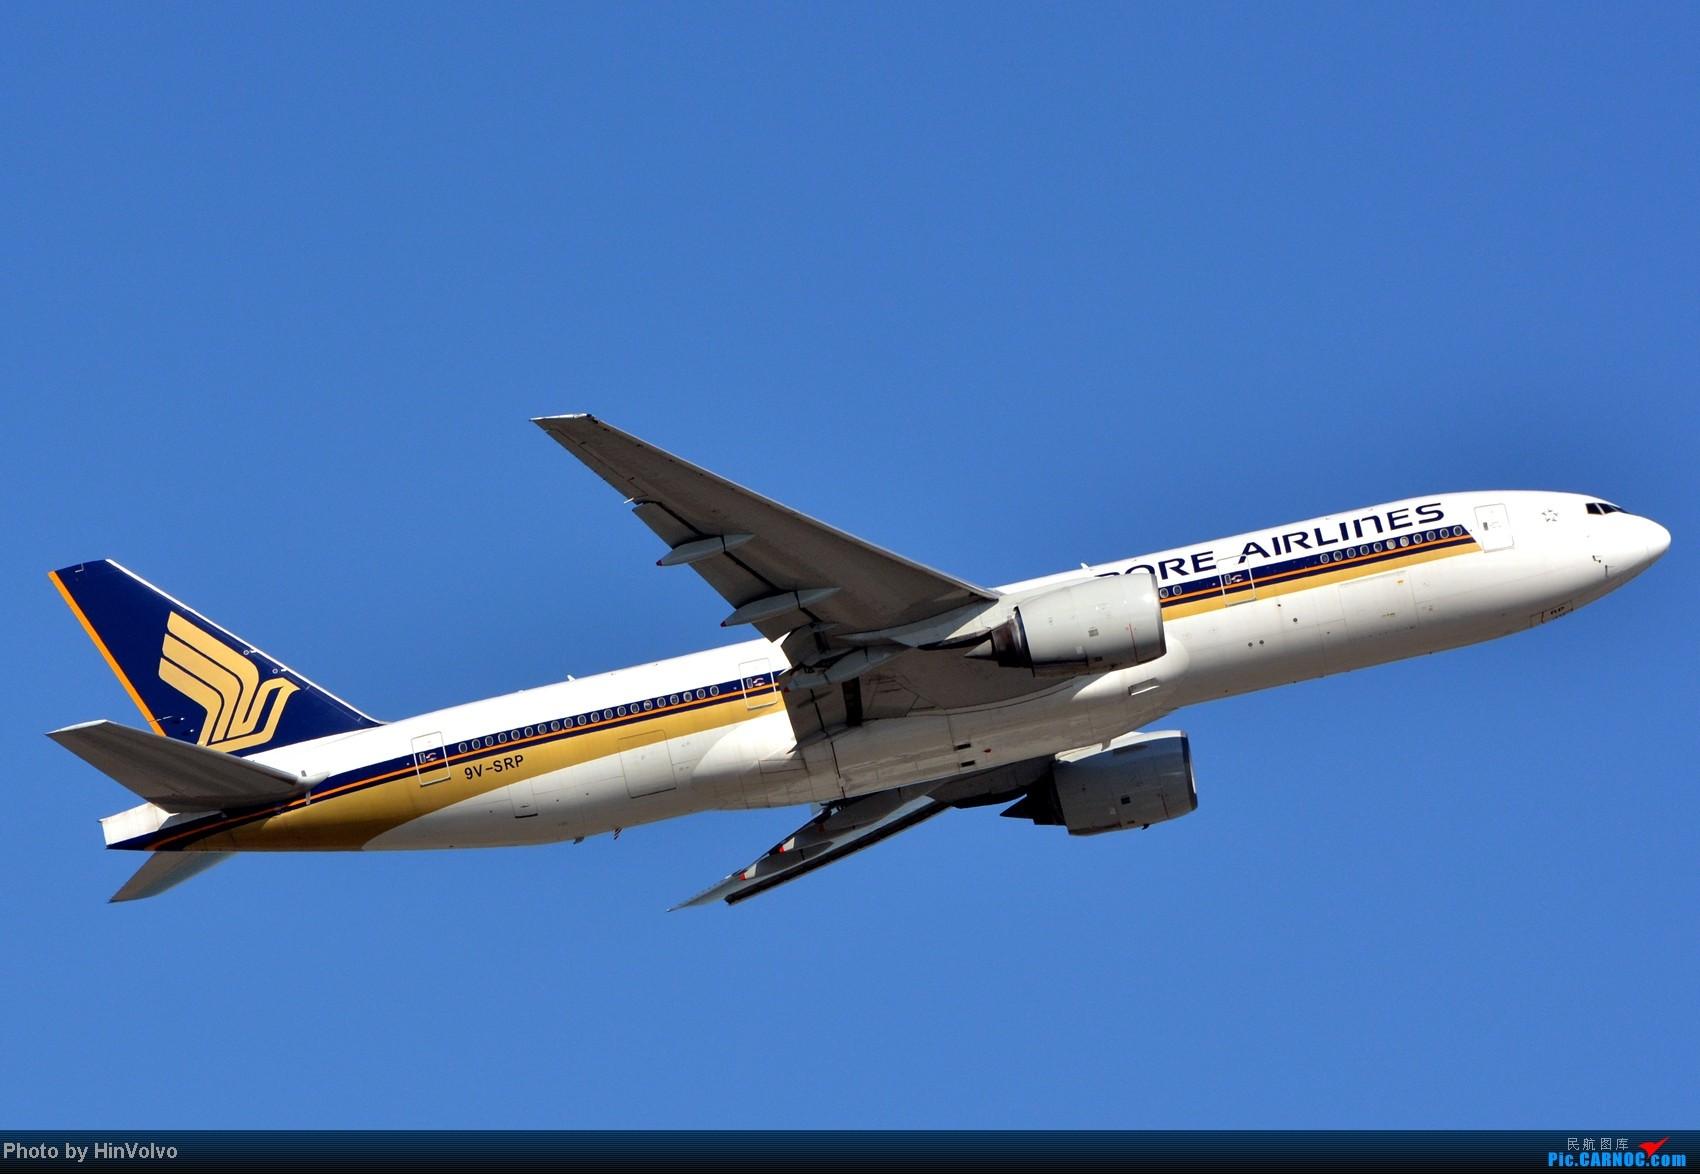 Re:[原创]~~~~多圖系列~~~HKG,早上好!寒冷的天氣出發前往機場拍到中午。 BOEING 777-200 9V-SRP 中国香港赤鱲角机场